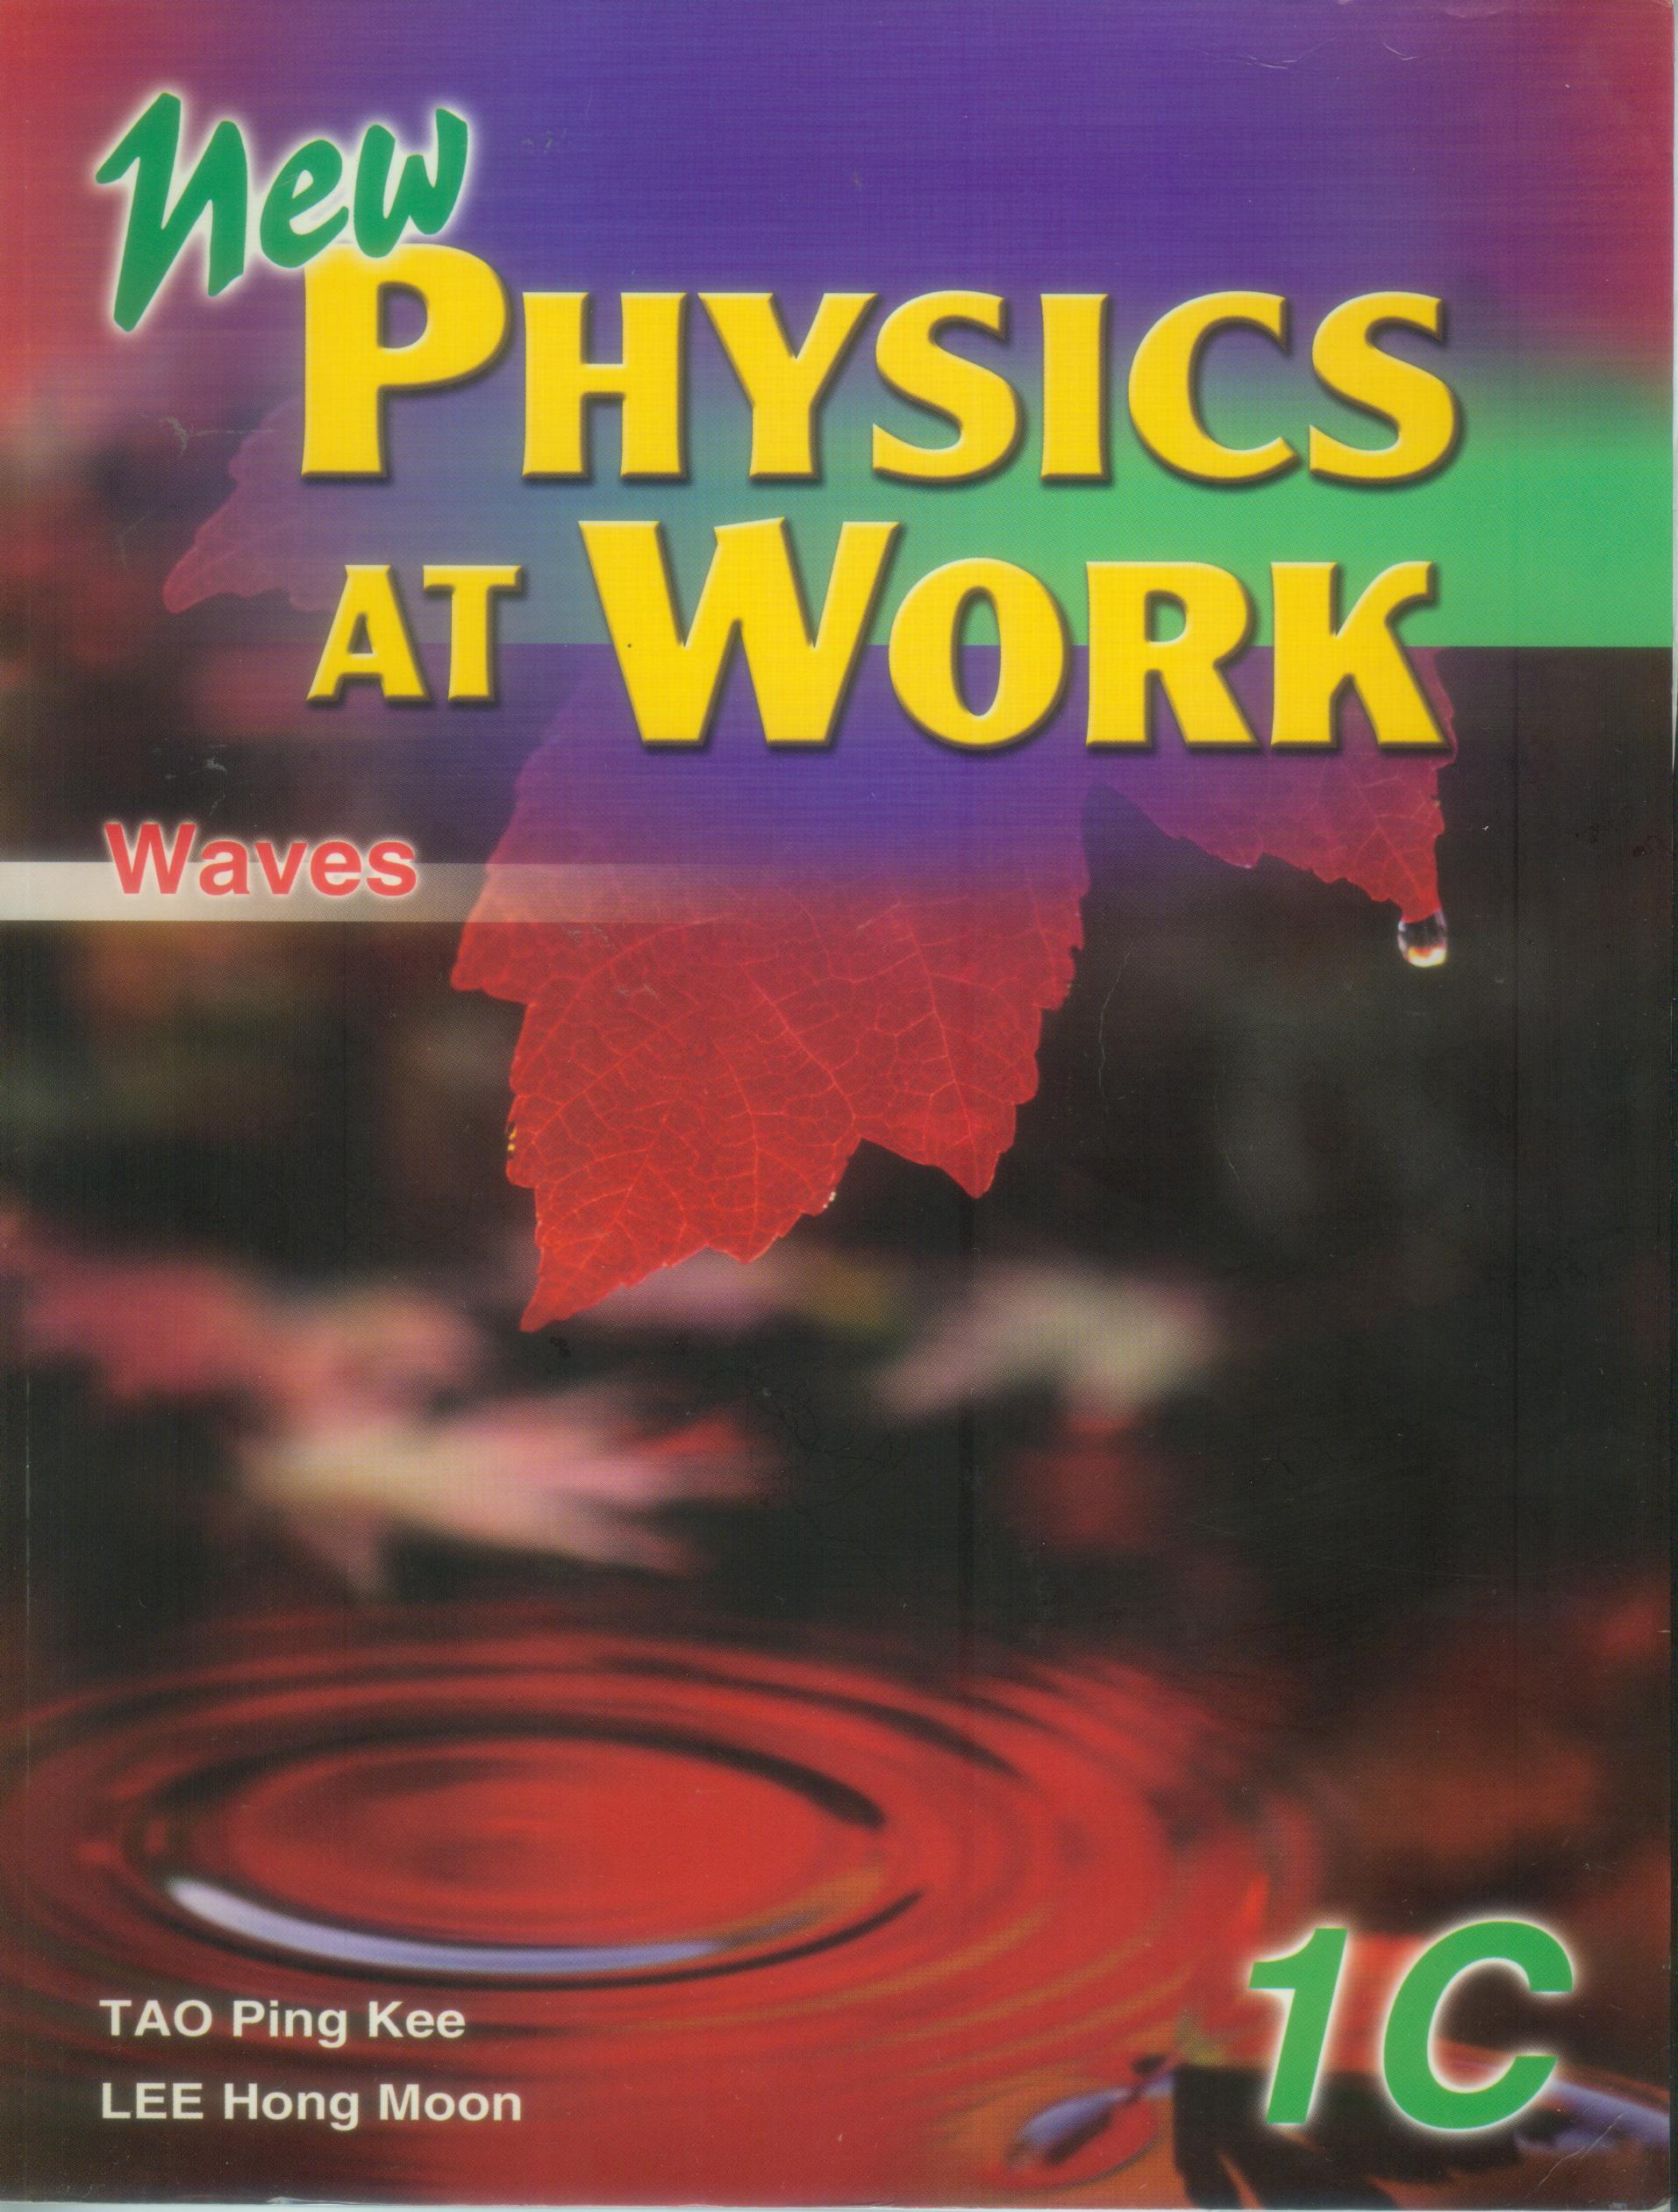 New Physics At Work 1C - Waves